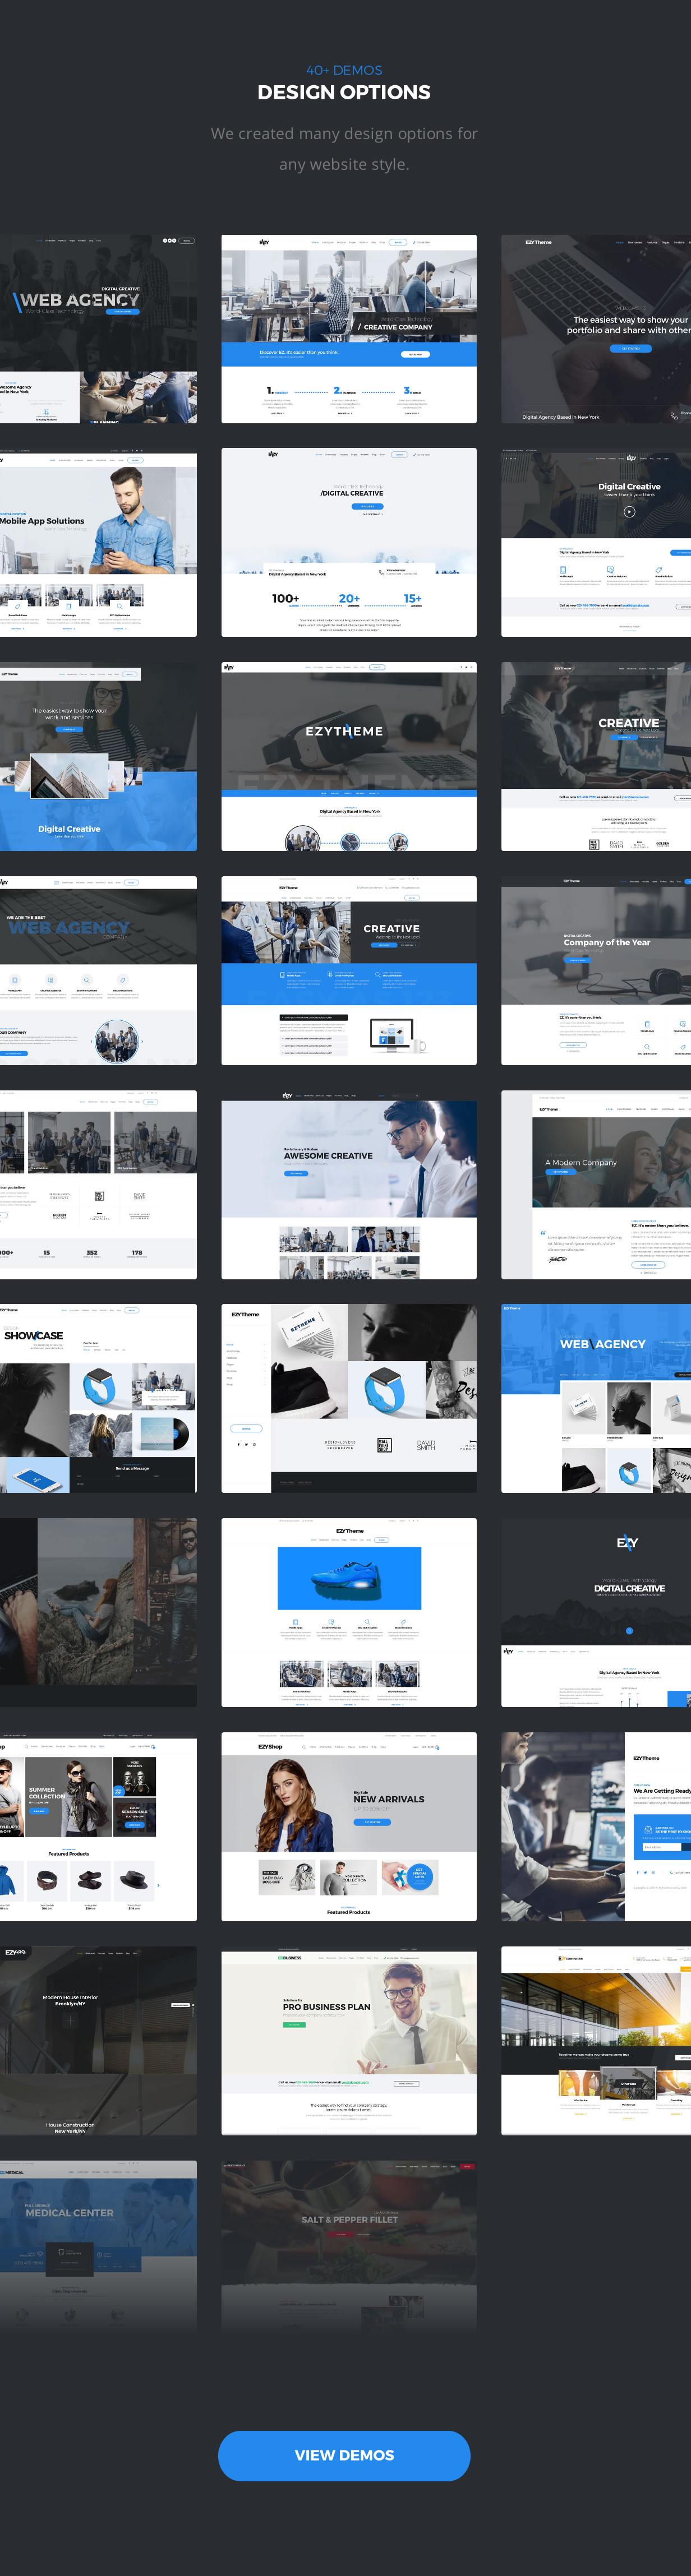 EZY – Responsive Multi-Purpose HTML5 Template   Bootstrap4